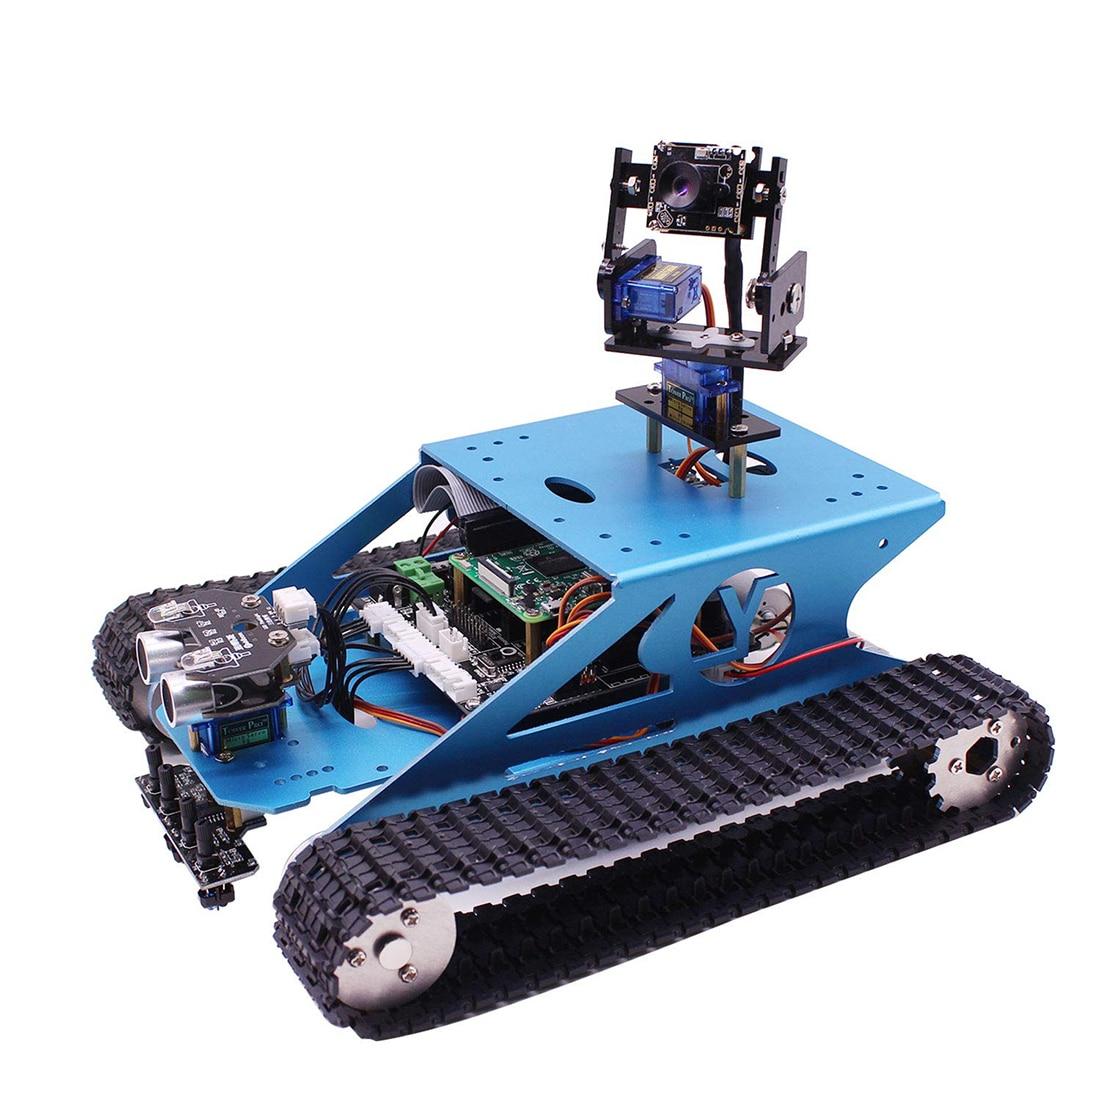 Tracked Tank Smart Robotic Bluetooth Video Programming Toy Self-Balance Car Robot Kit With Raspberry 4B (1G/2G/4G Memory)